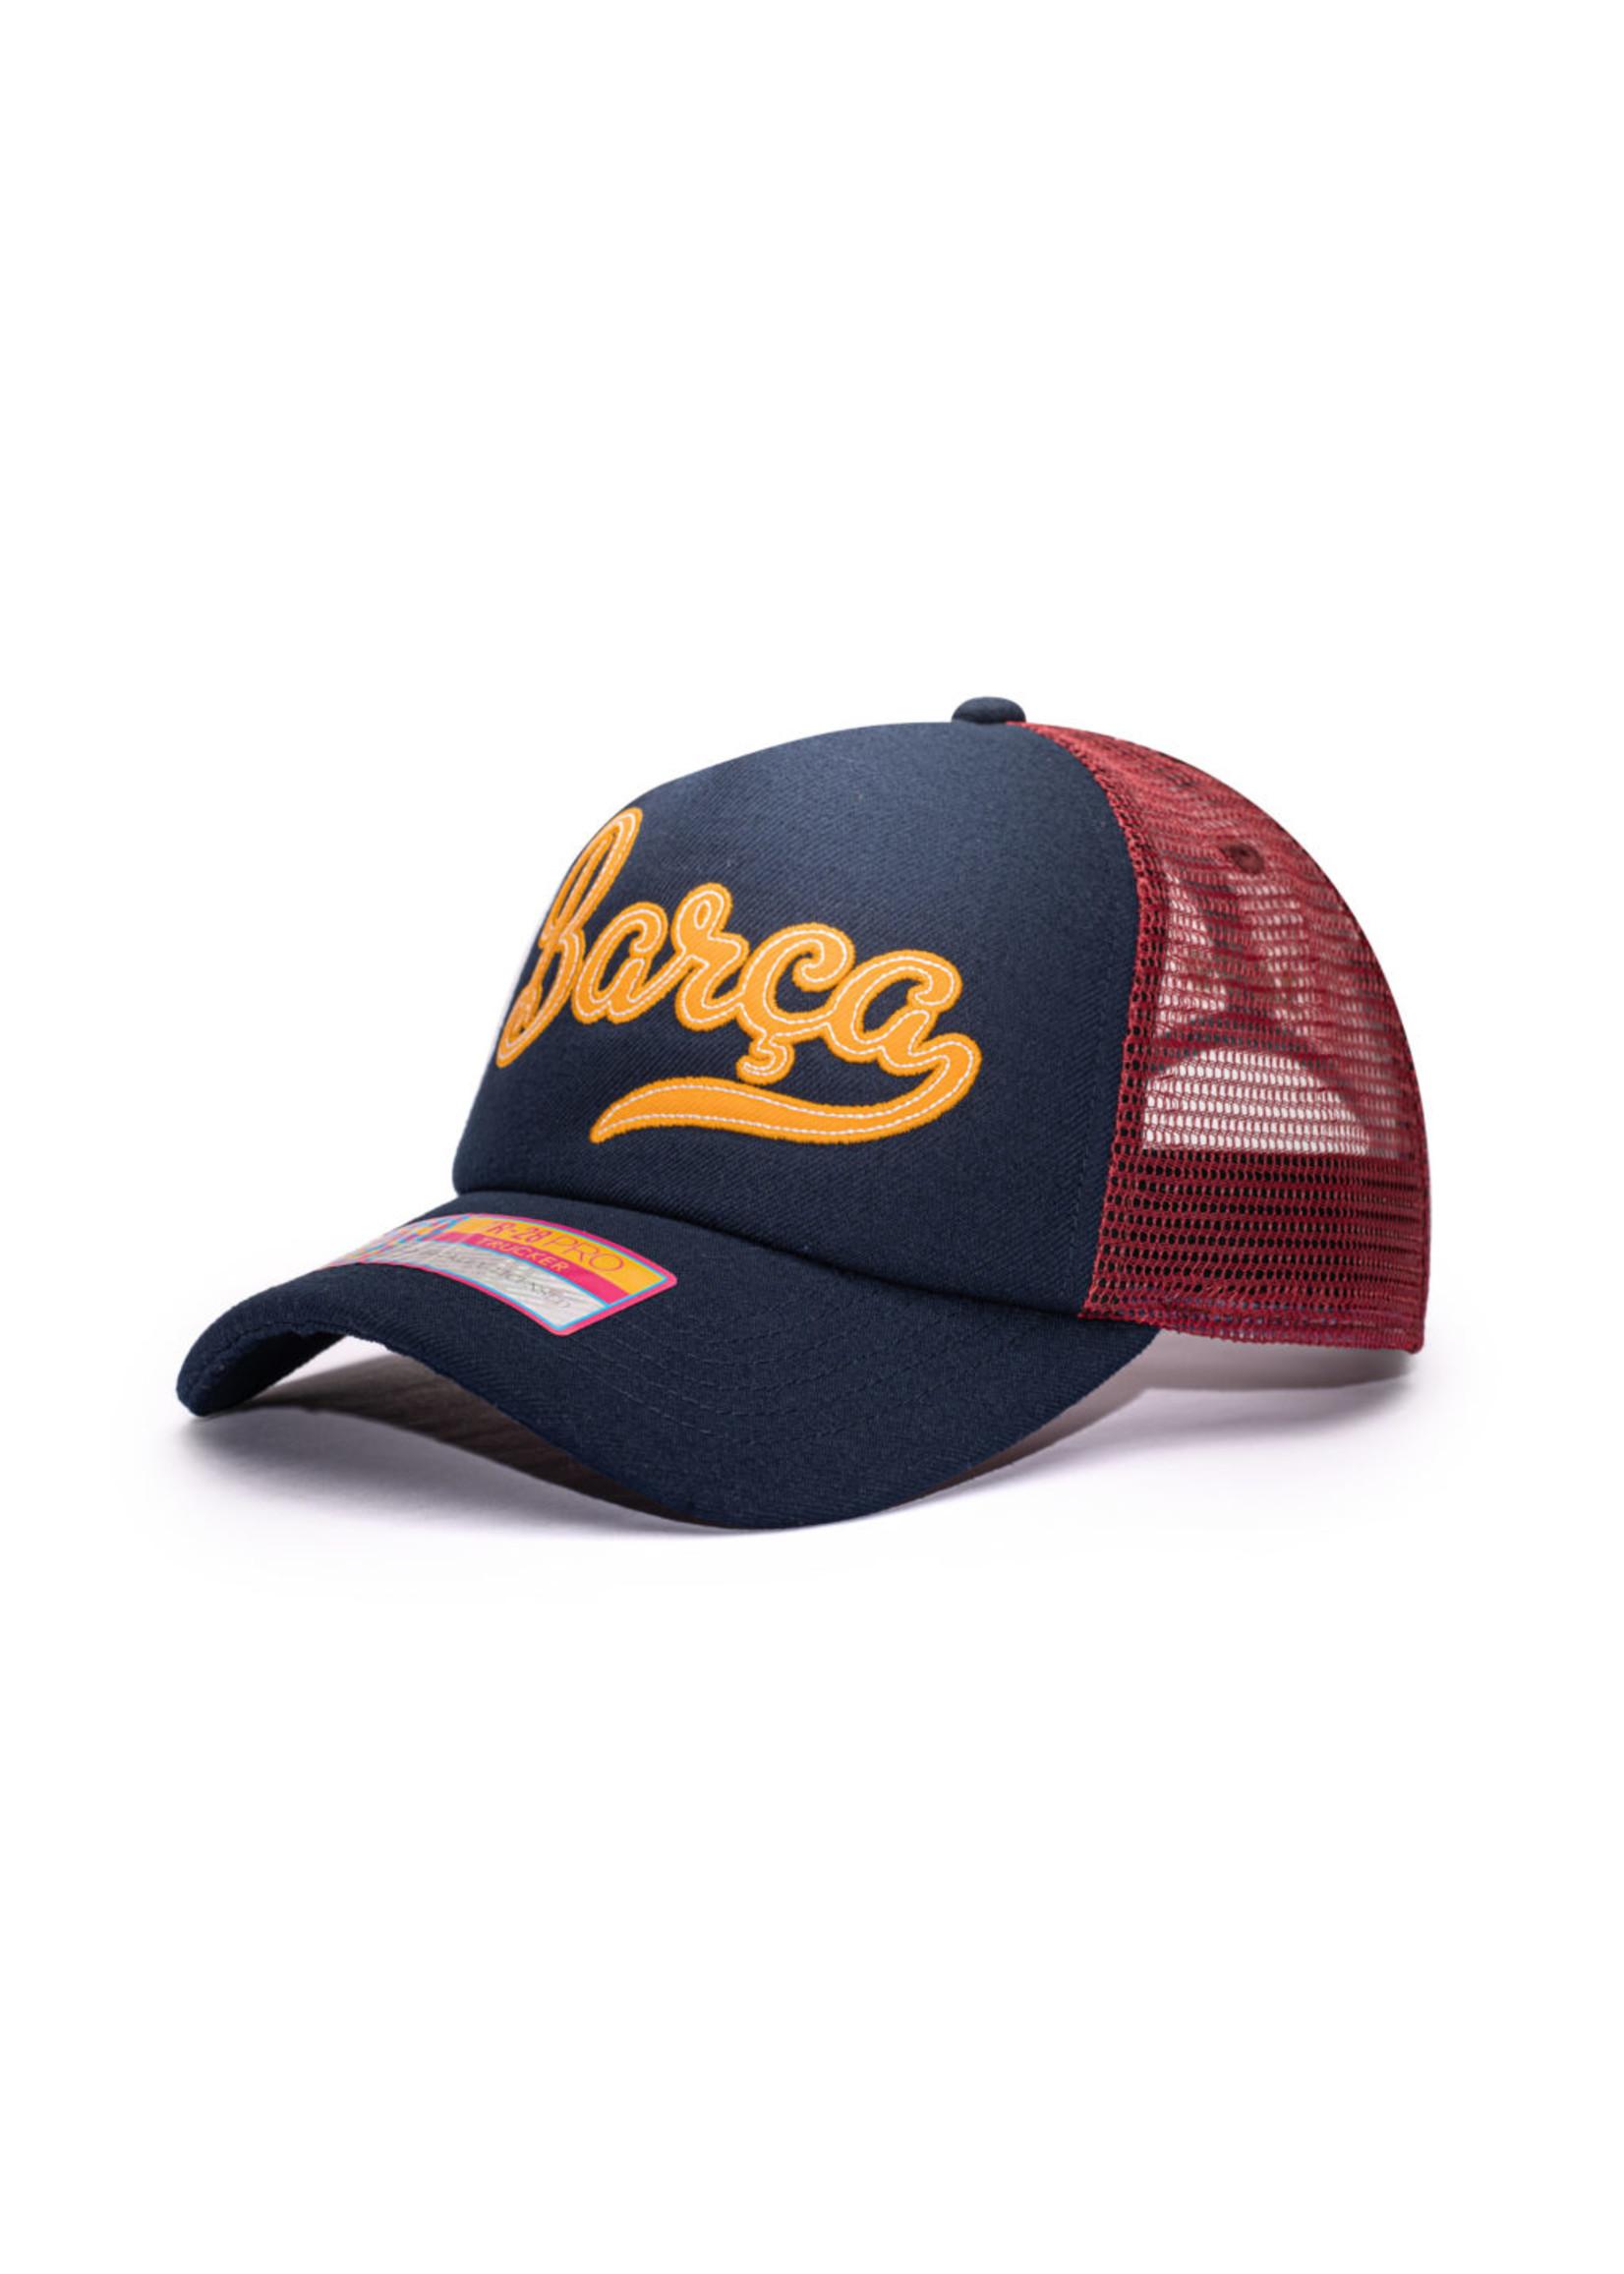 Barcelona Retro Trucker Hat